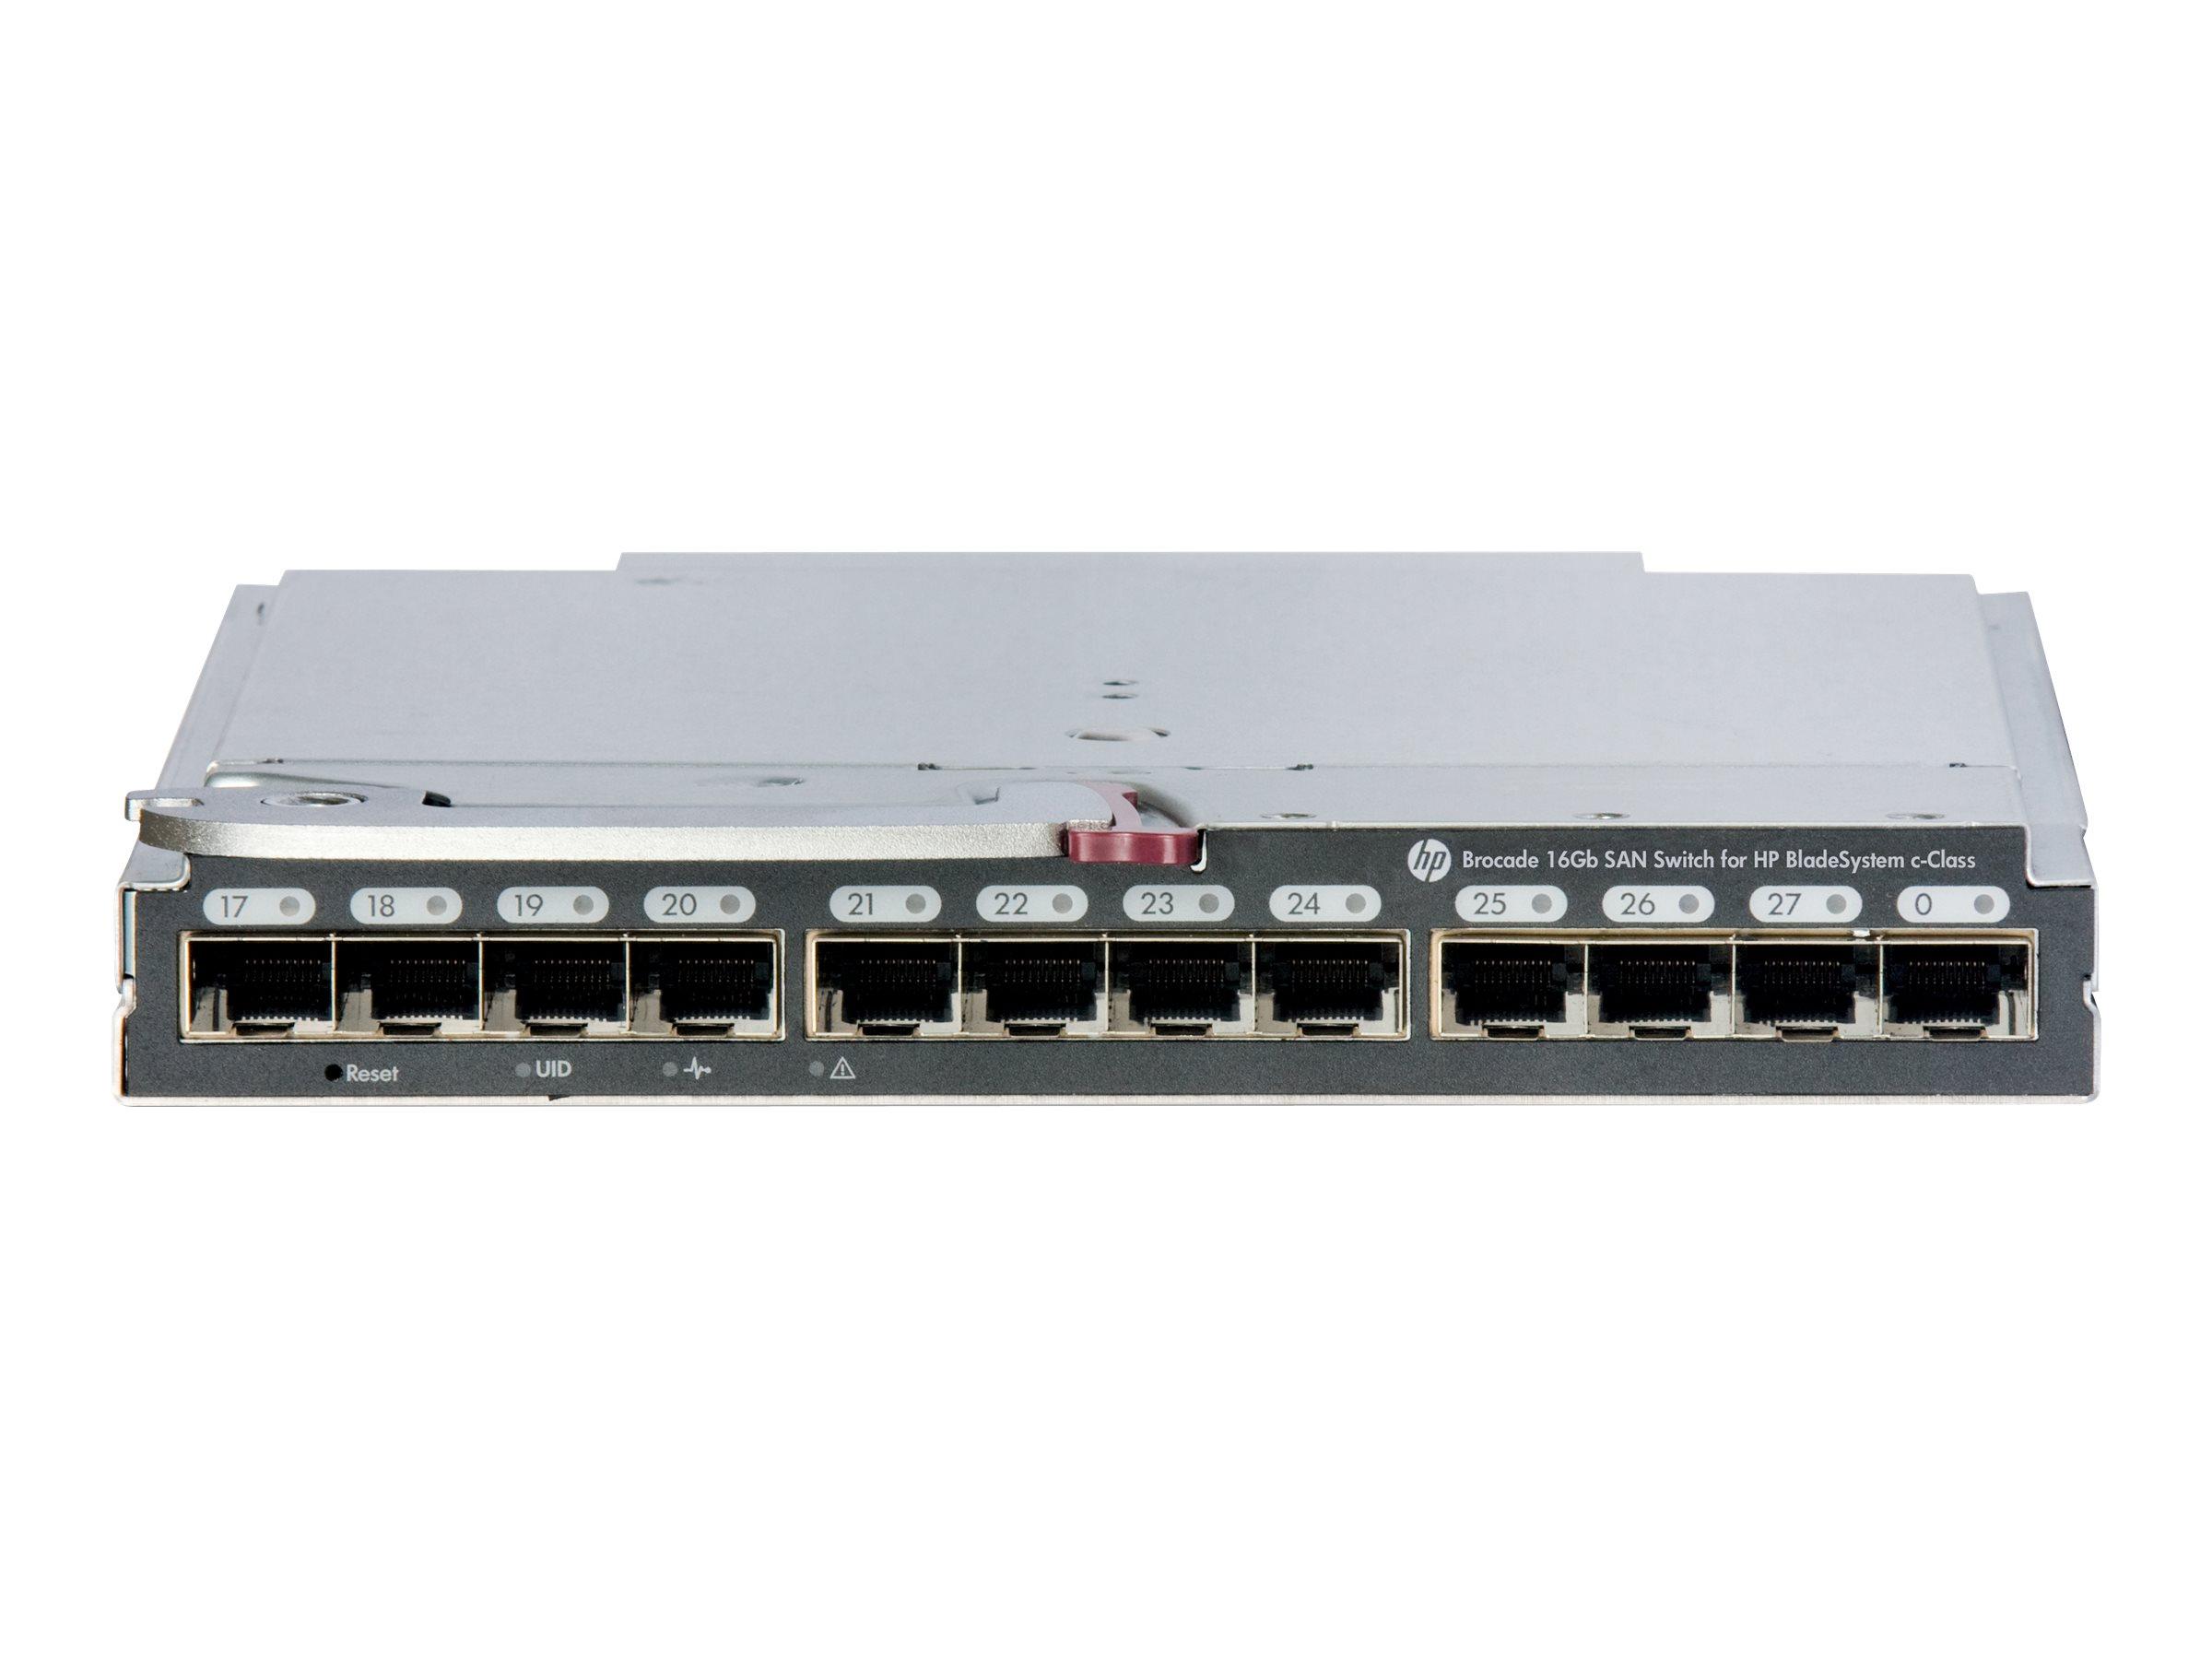 [Wiederaufbereitet] Brocade 16Gb/16 SAN Switch for HP BladeSystem c-Class - Switch - managed - 16 x 16Gb Fibre Channel - Plugin-